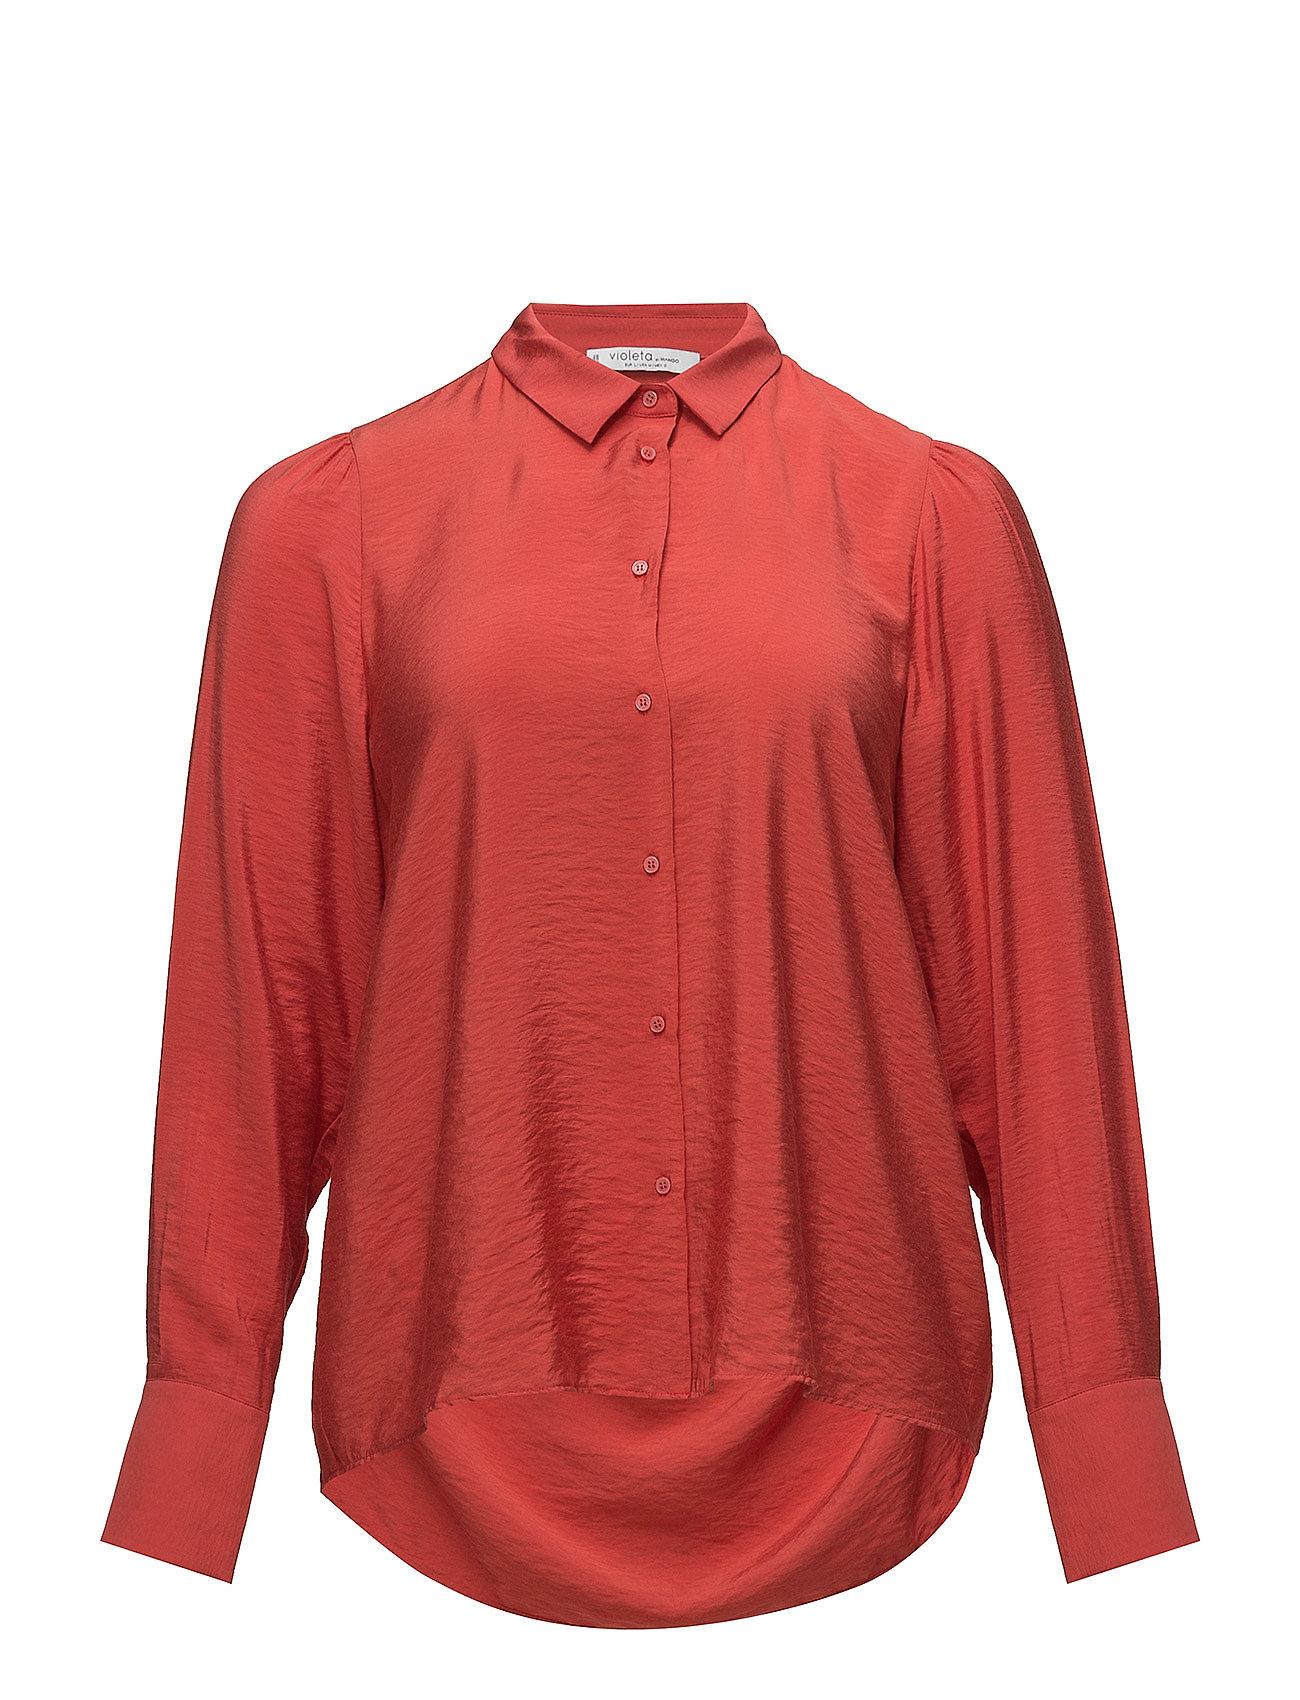 Image of Puffed-Shoulder Shirt (3052623123)